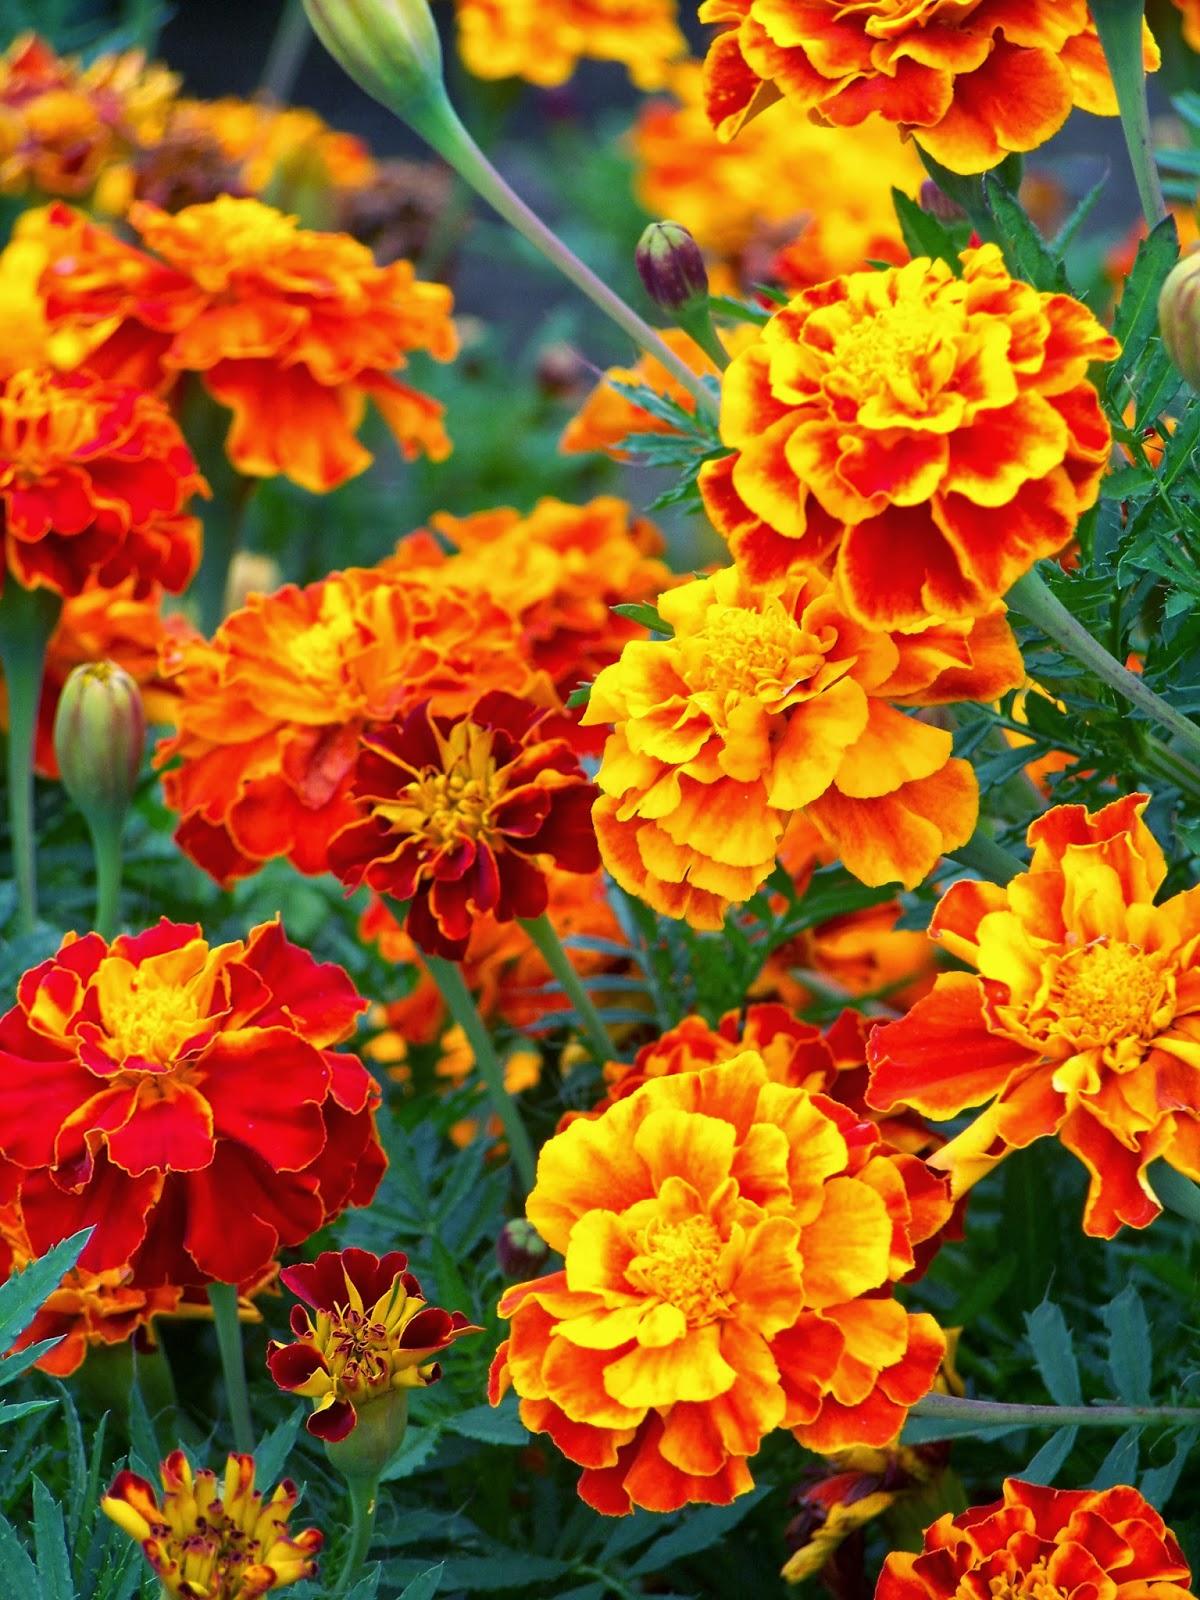 The Marigold Tarot Major Arcana The: Tell Me A Story: MARIGOLD FLOWER BED